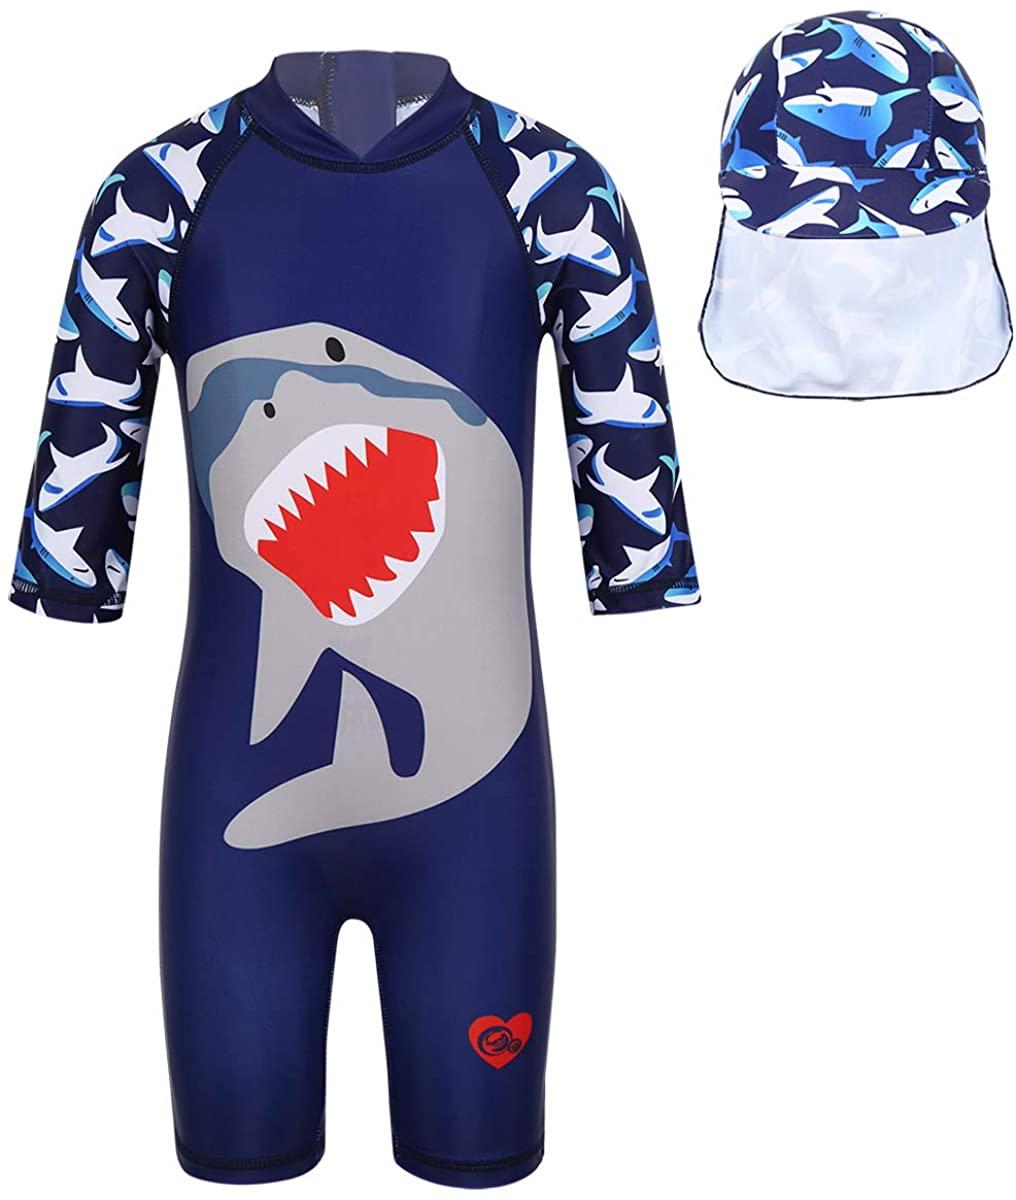 Aiihoo Kids Boys One Piece Shark Pattern Printed Zipper Swimsuit Beachwear with Swimming Cap